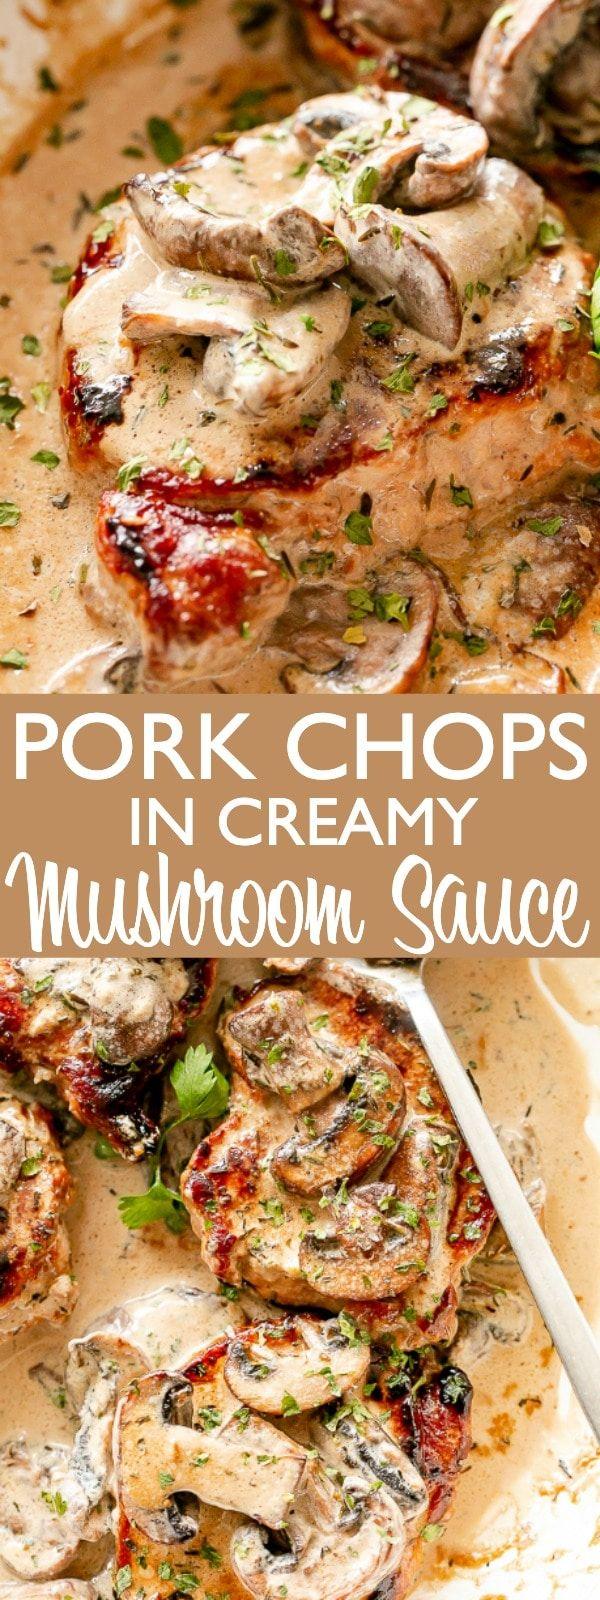 Skillet Pork Chops in Creamy Mushroom Sauce   Pork Chops Recipe